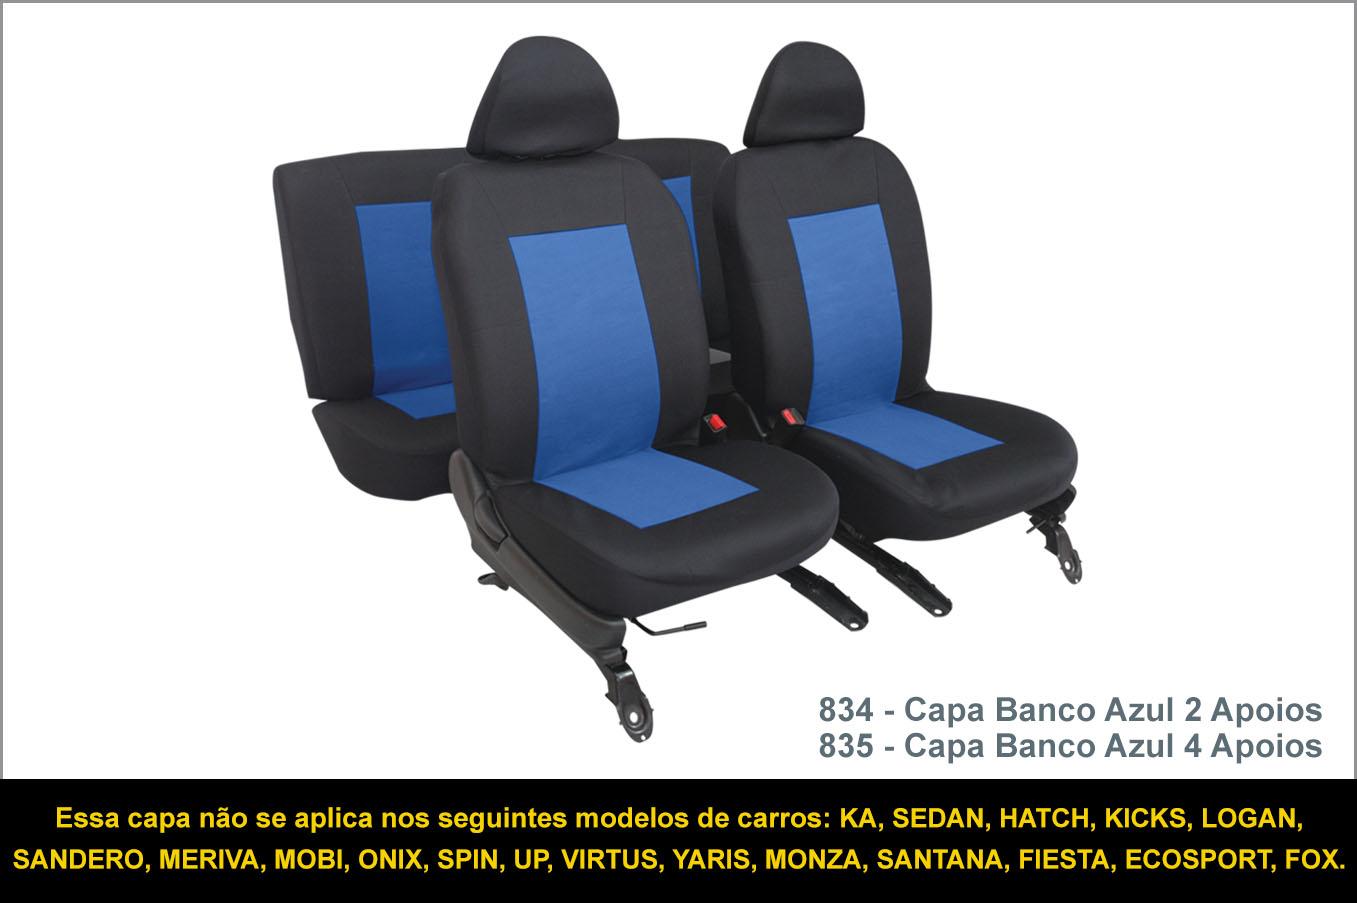 834 835 Capas Azul - Essa capa não se aplica nos seguintes modelos de carros: KA, SEDAN, HATCH, KICKS, LOGAN, SANDERO, MERIVA, MOBI, ONIX, SPIN, UP, VIRTUS, YARIS, MONZA, SANTANA, FIESTA, ECOSPORT, FOX.